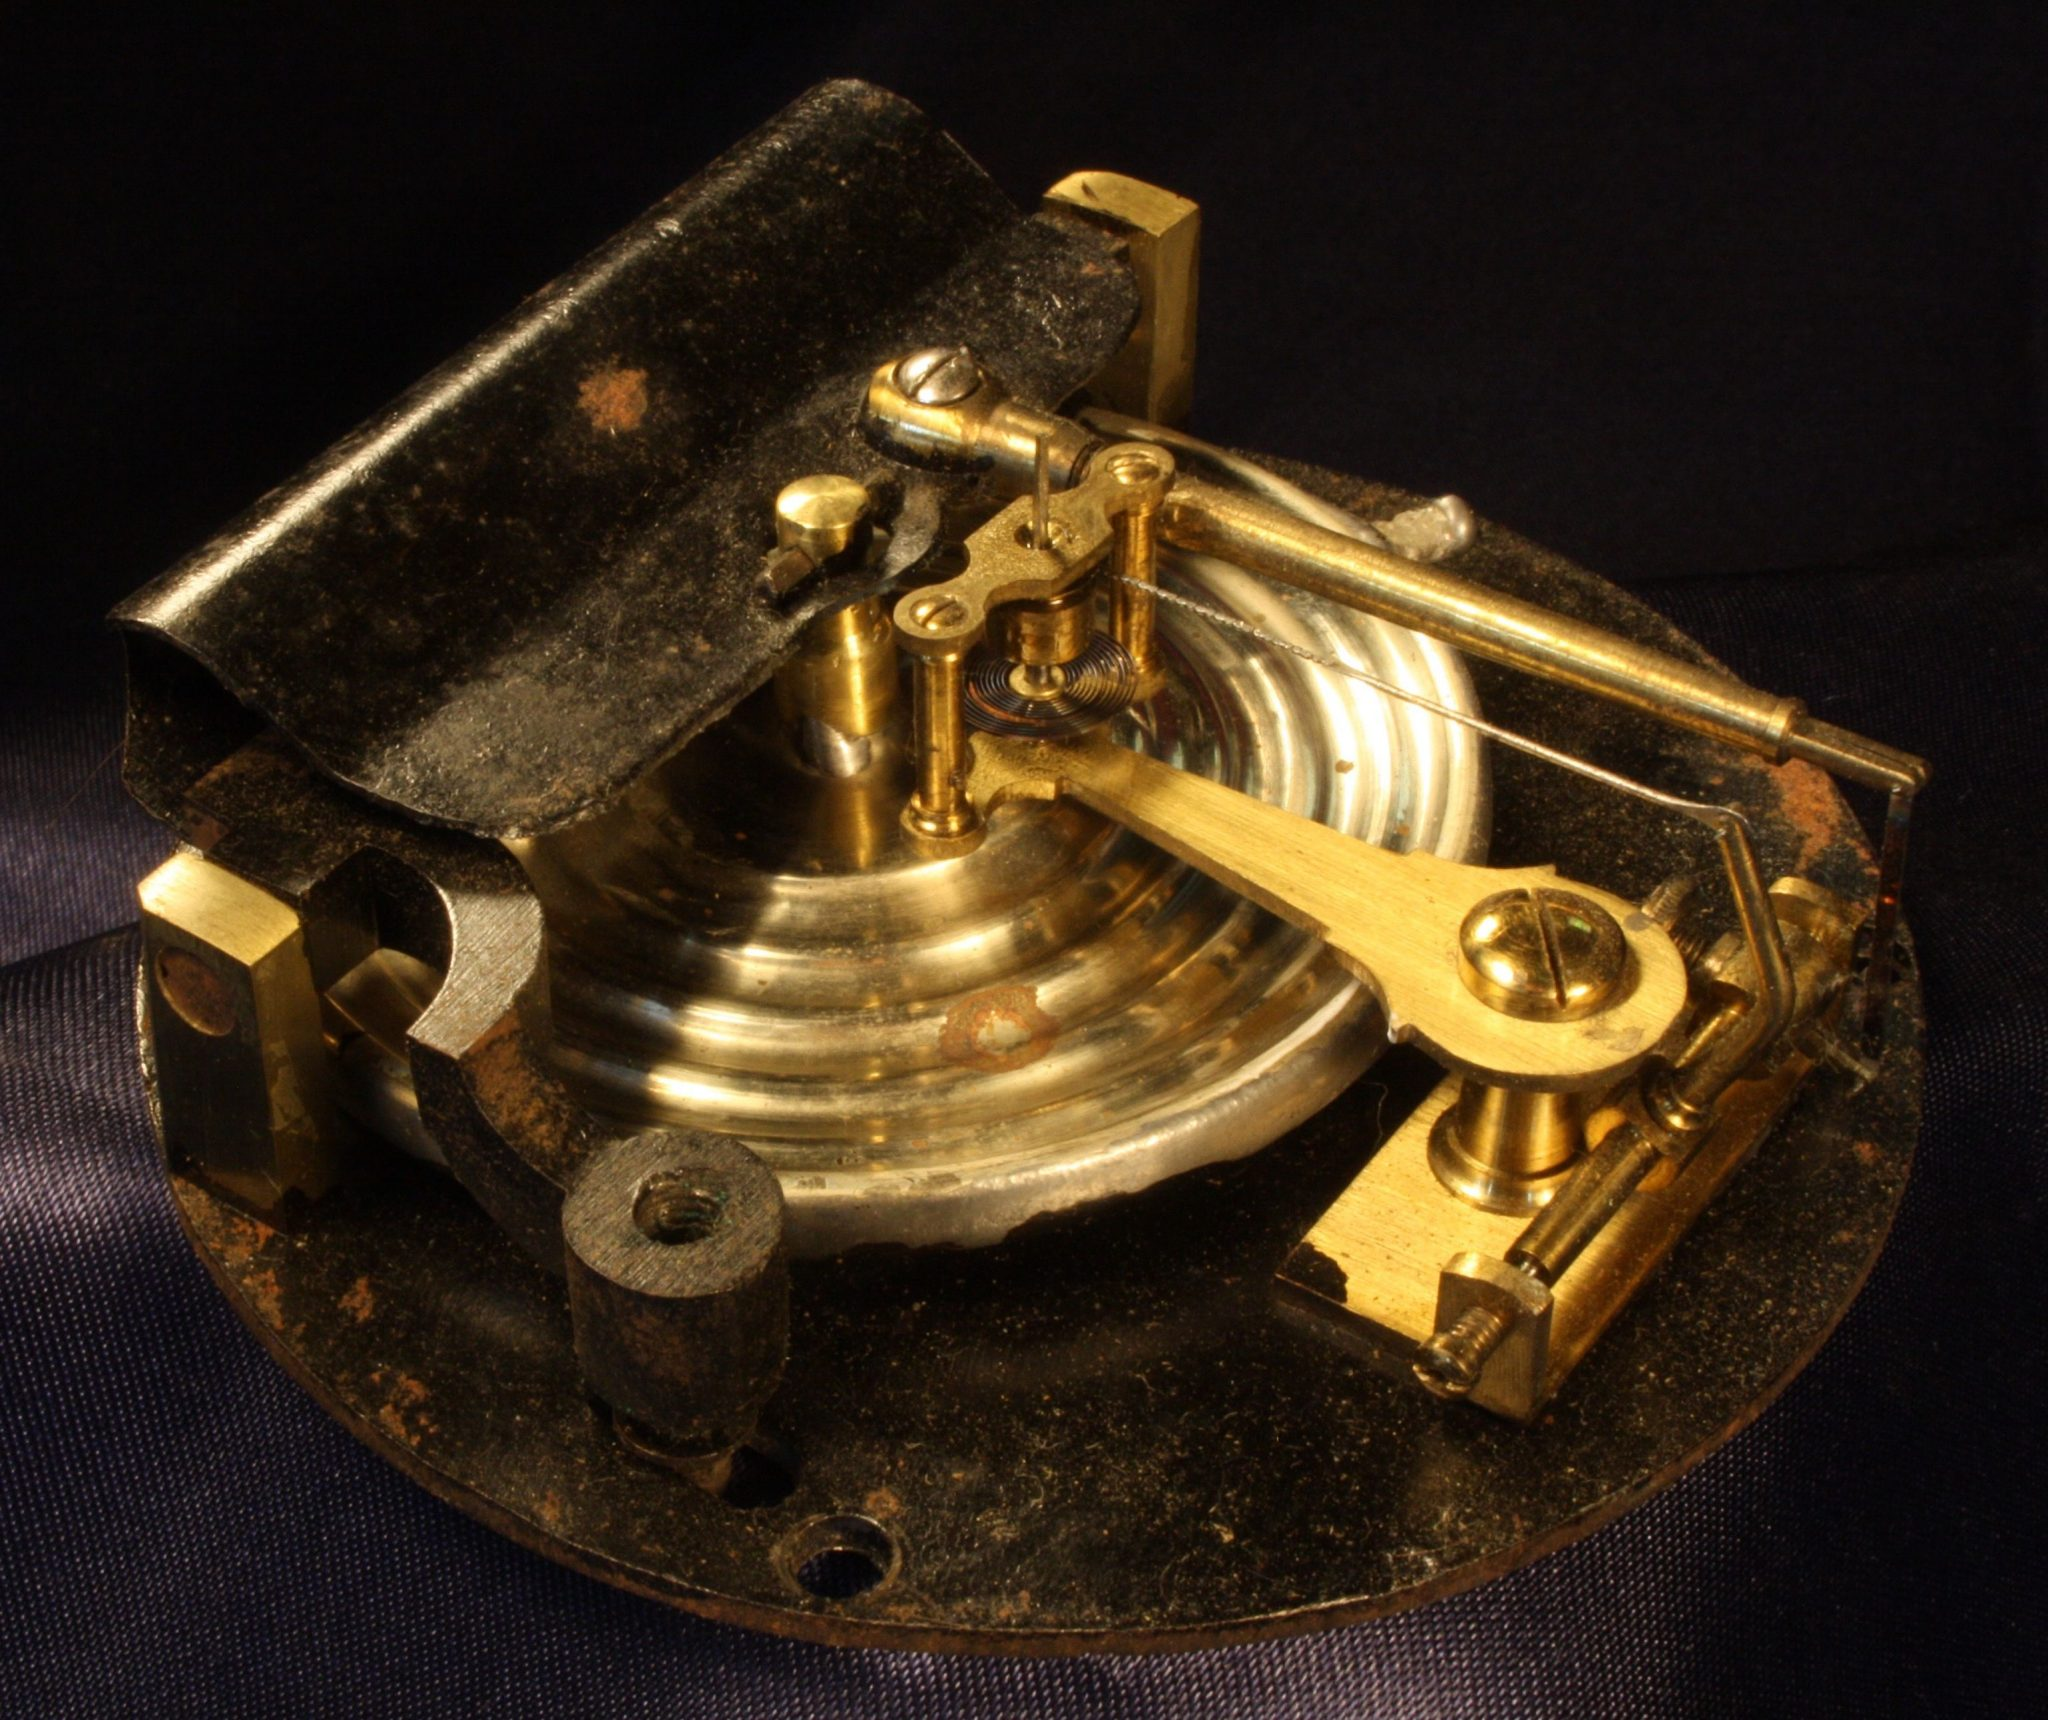 Image of Ships Wheel Barometer by Betjemann